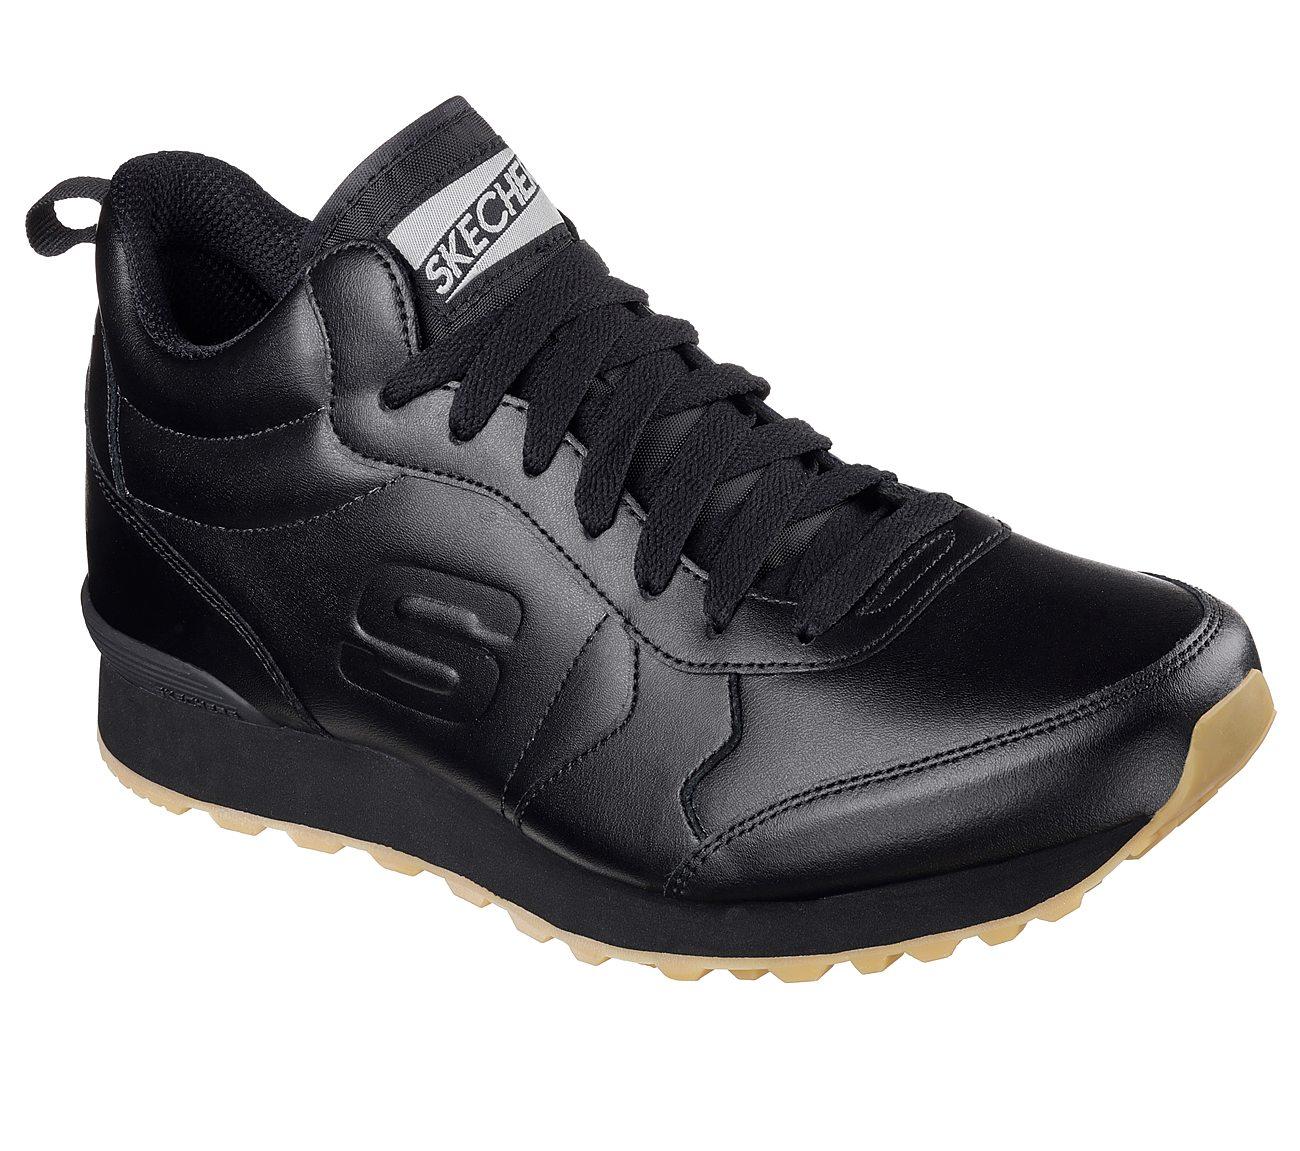 Buy SKECHERS OG 85 Twin Tip Originals Shoes 3eaaG